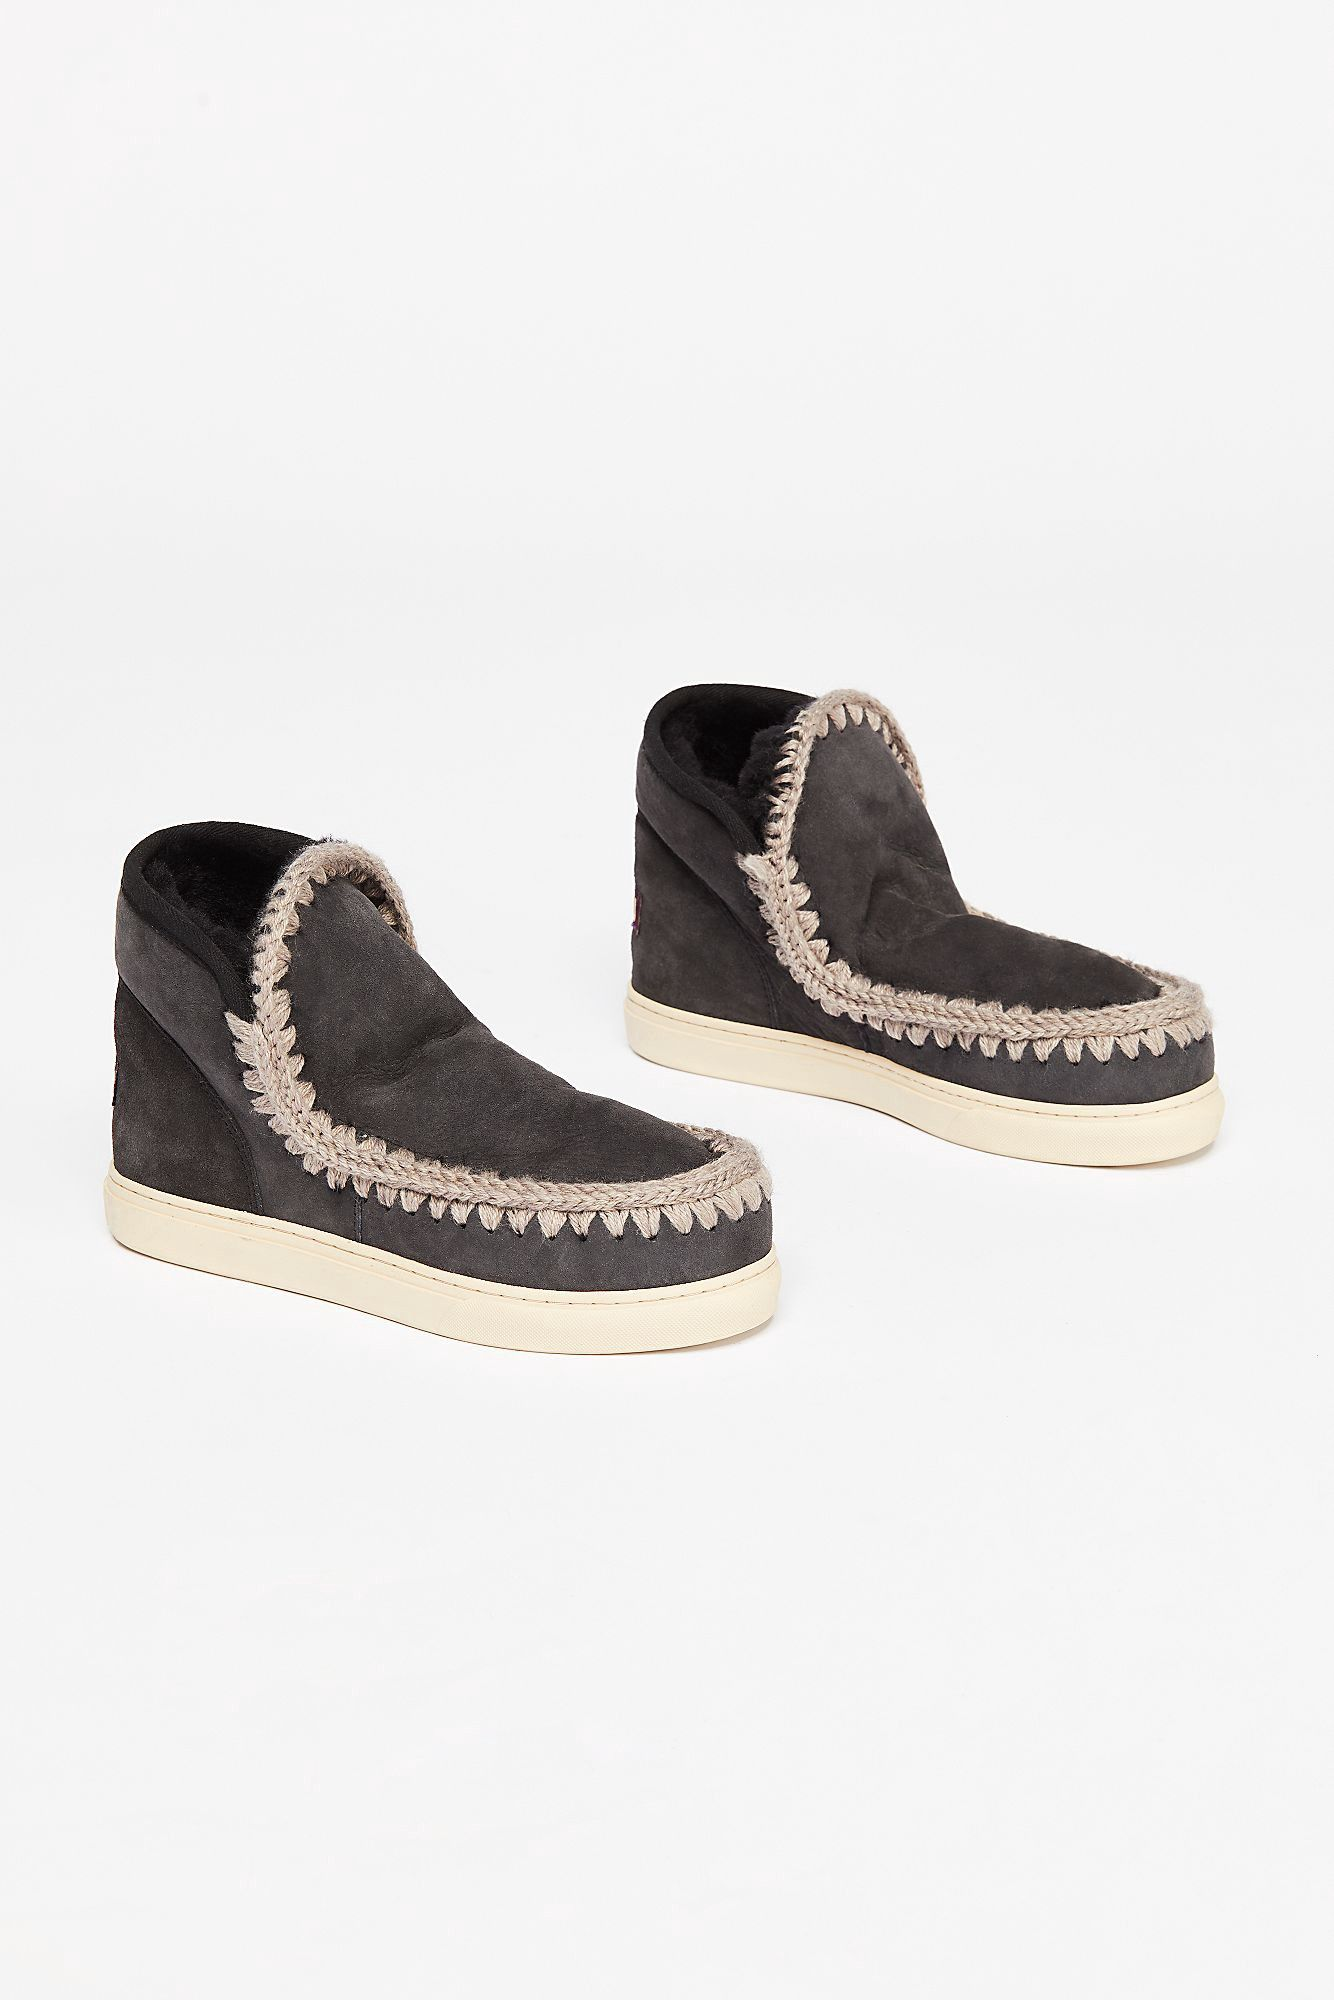 Free People Mou Daybreak Sneaker Boot Off Black 36 Euro